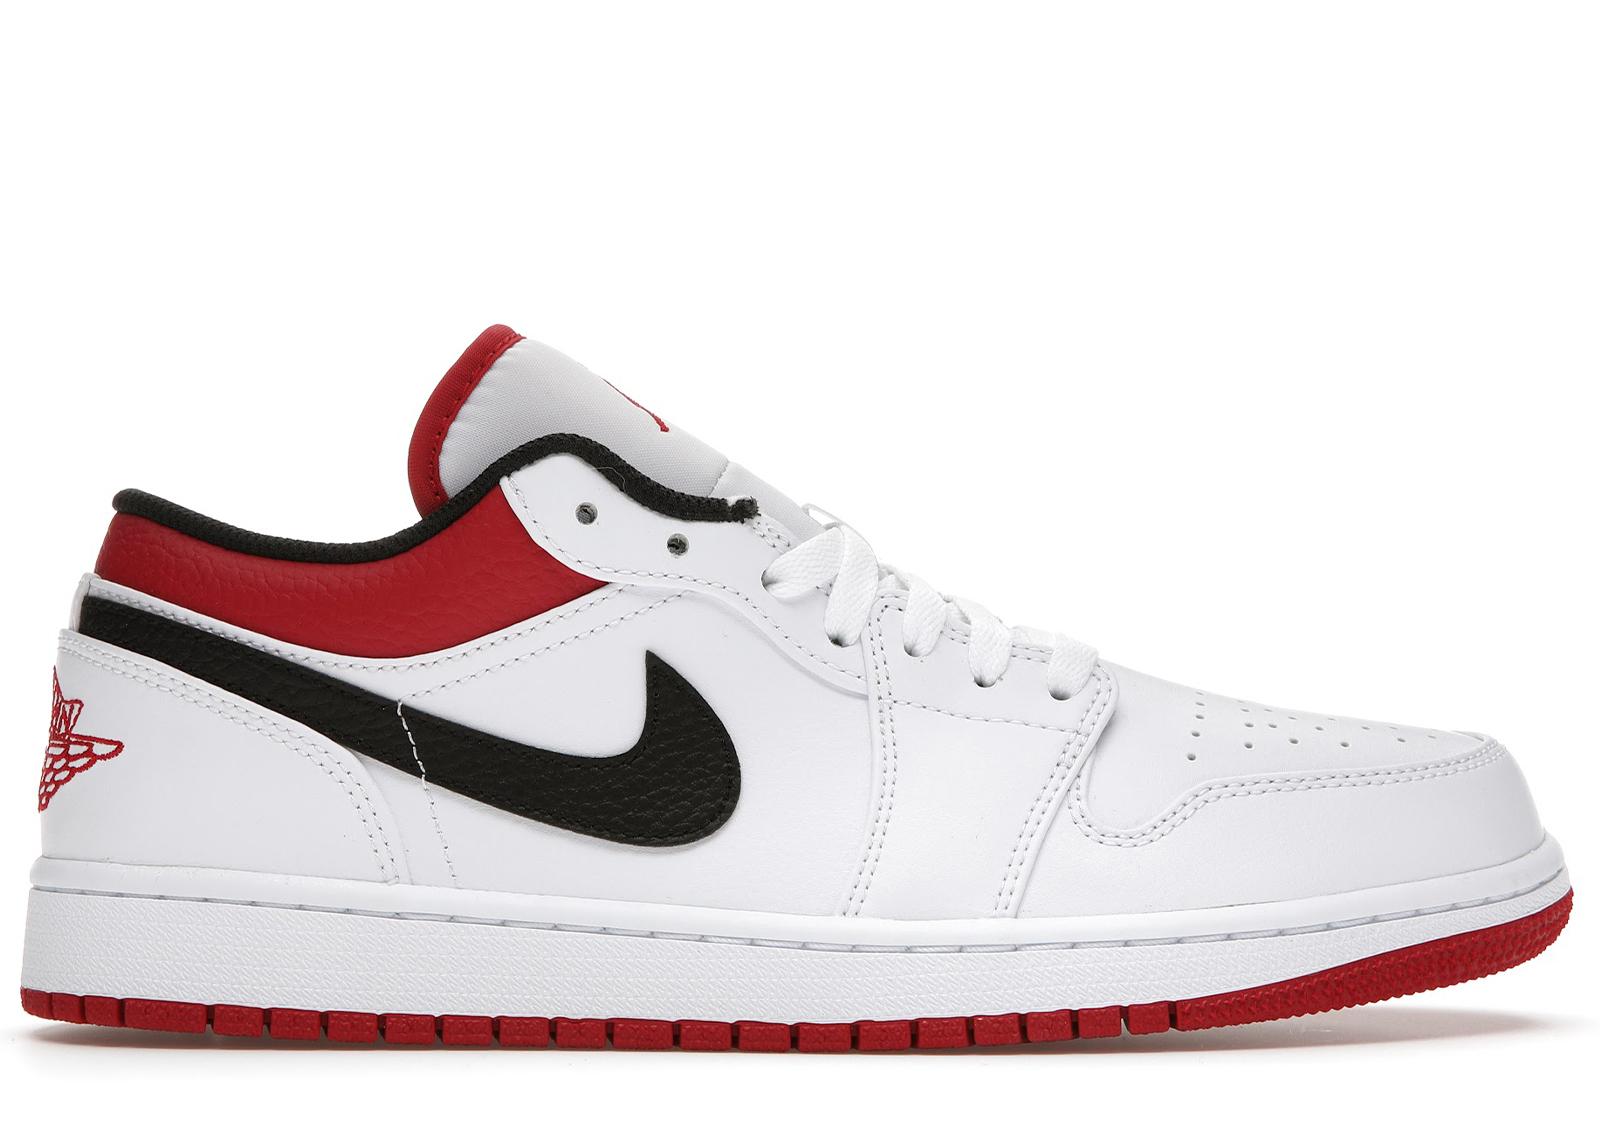 Jordan 1 Low White University Red Black - 553558-118